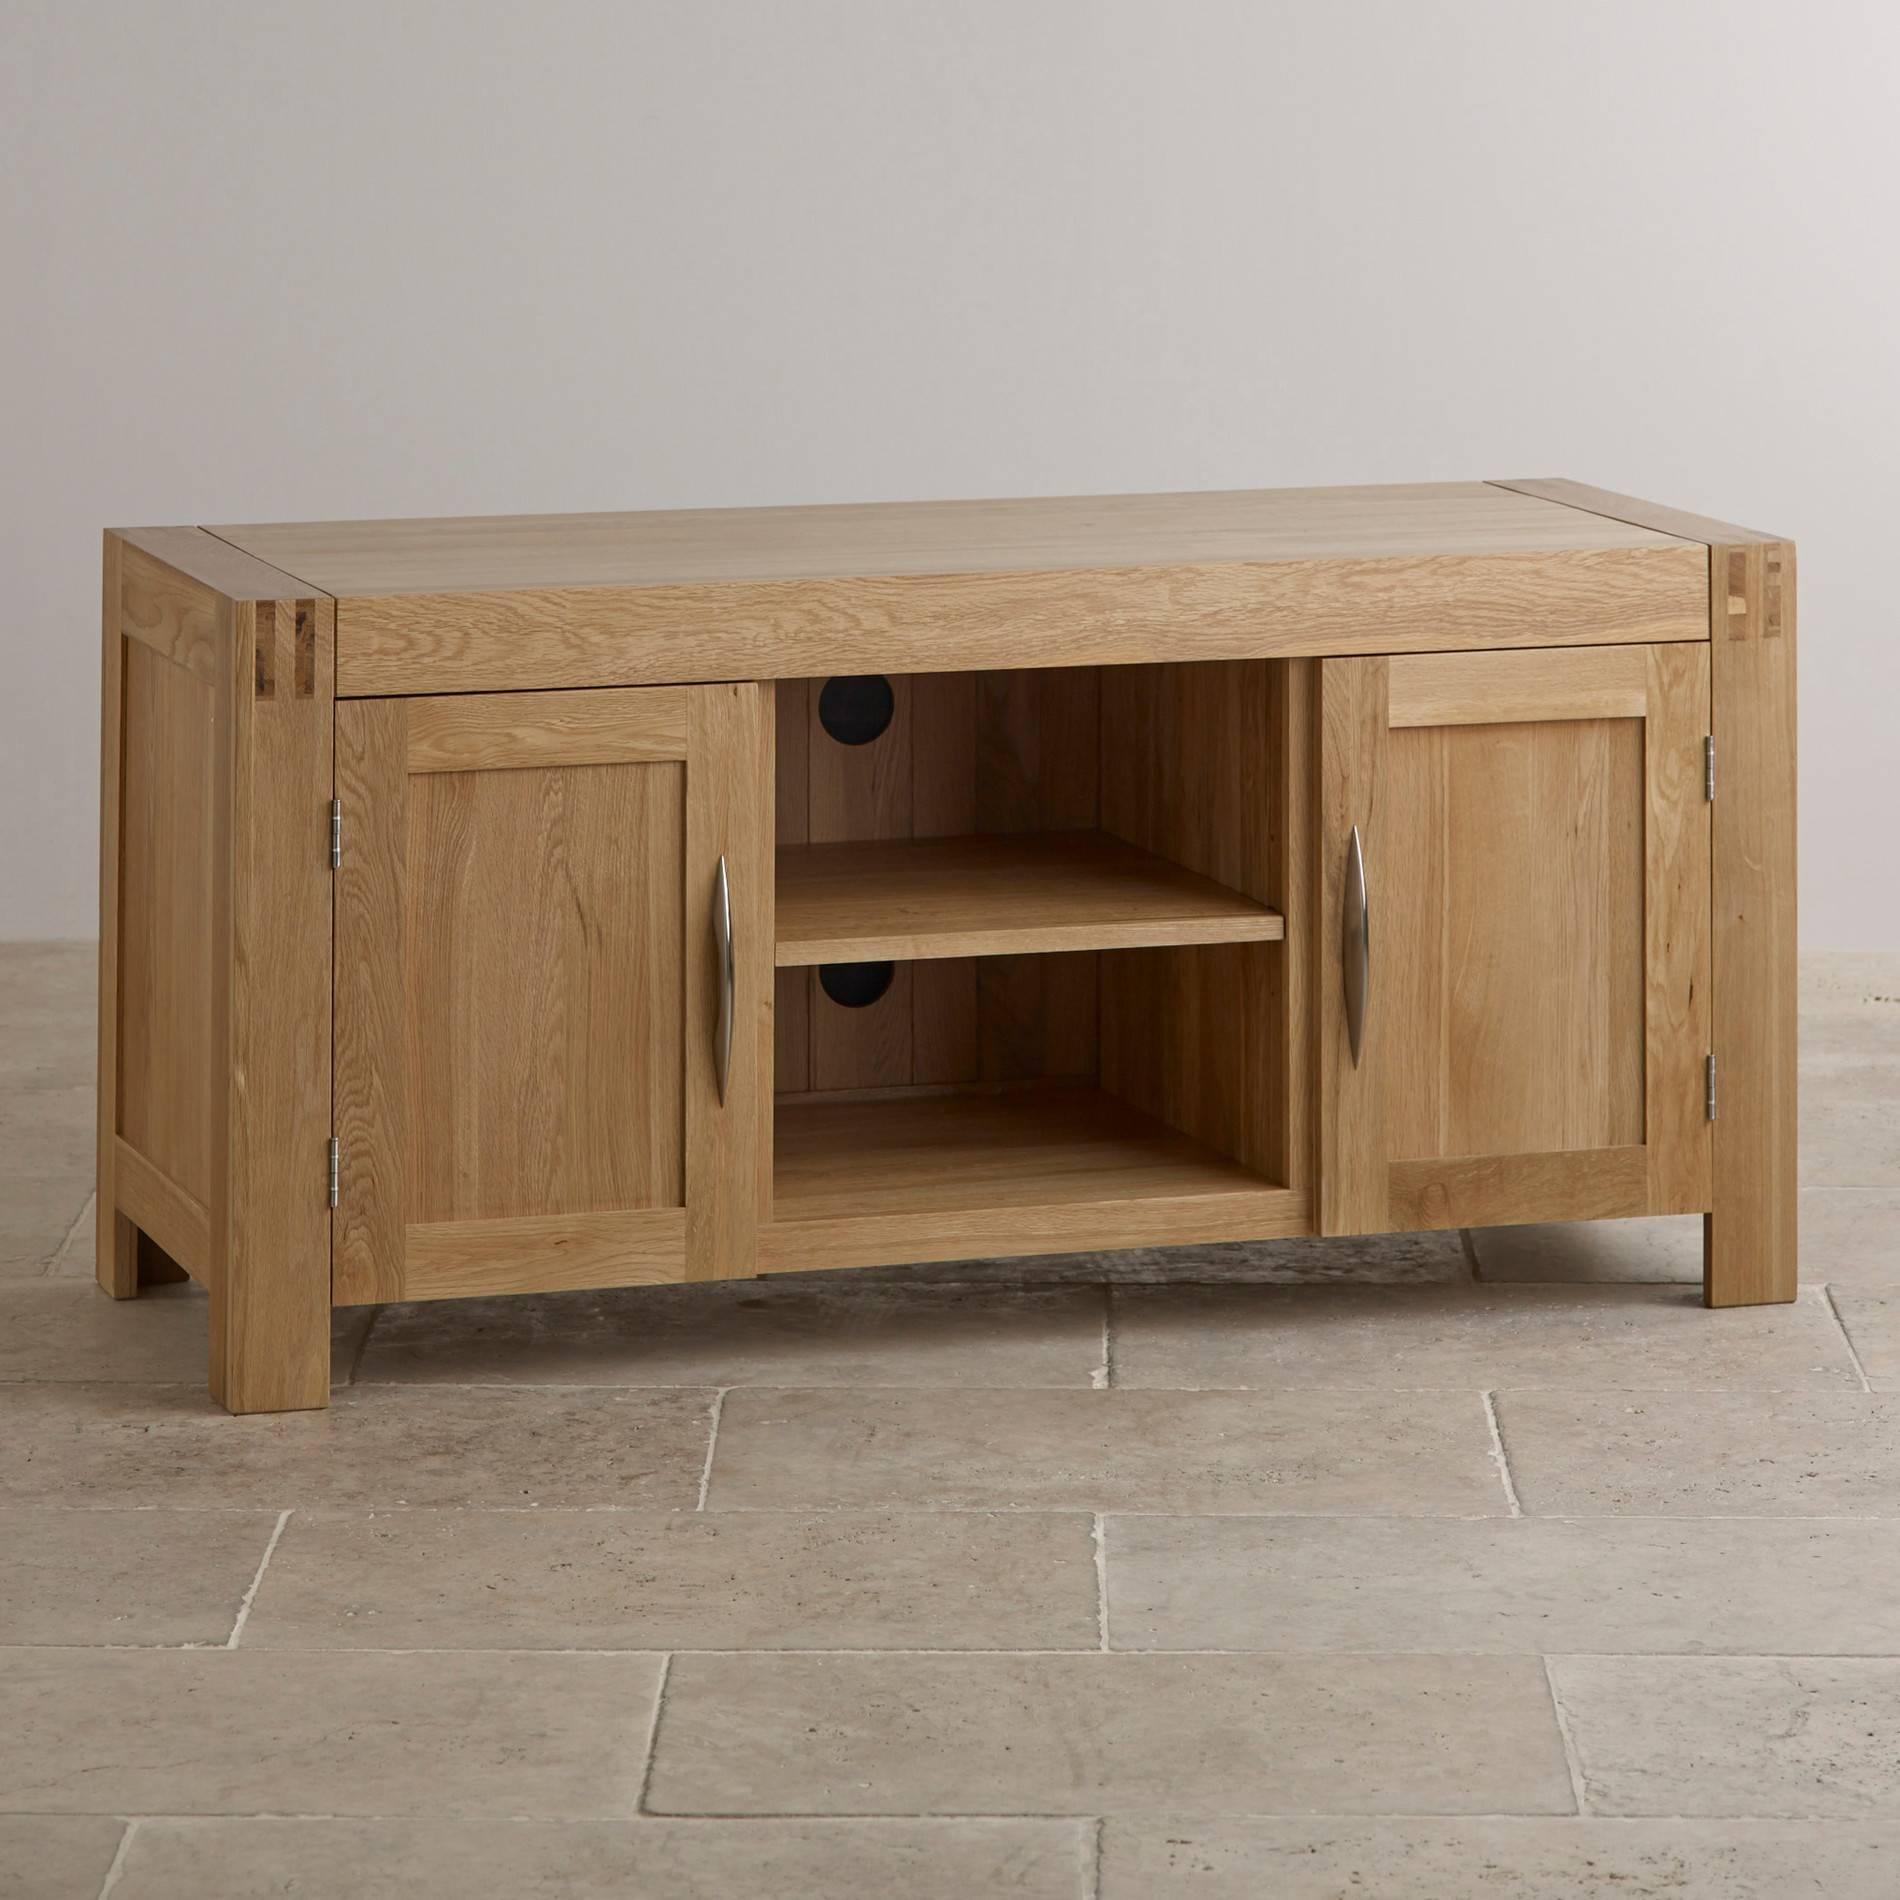 Alto Tv Cabinet In Solid Oak | Oak Furniture Land regarding Pine Tv Cabinets (Image 1 of 15)